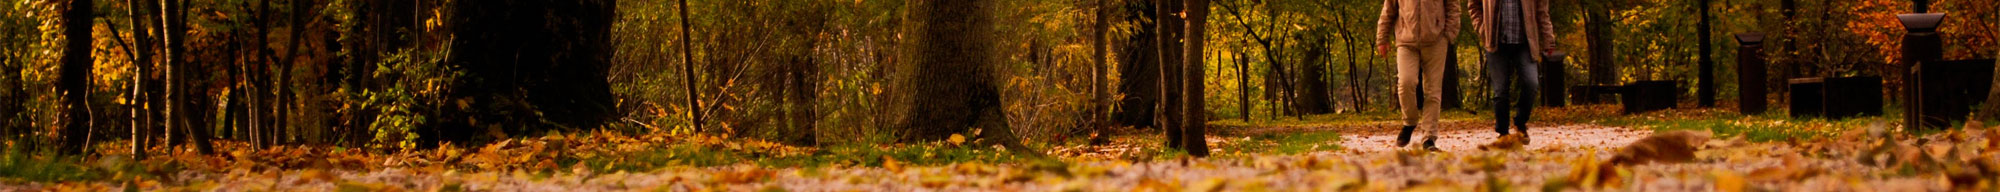 Fall banner image